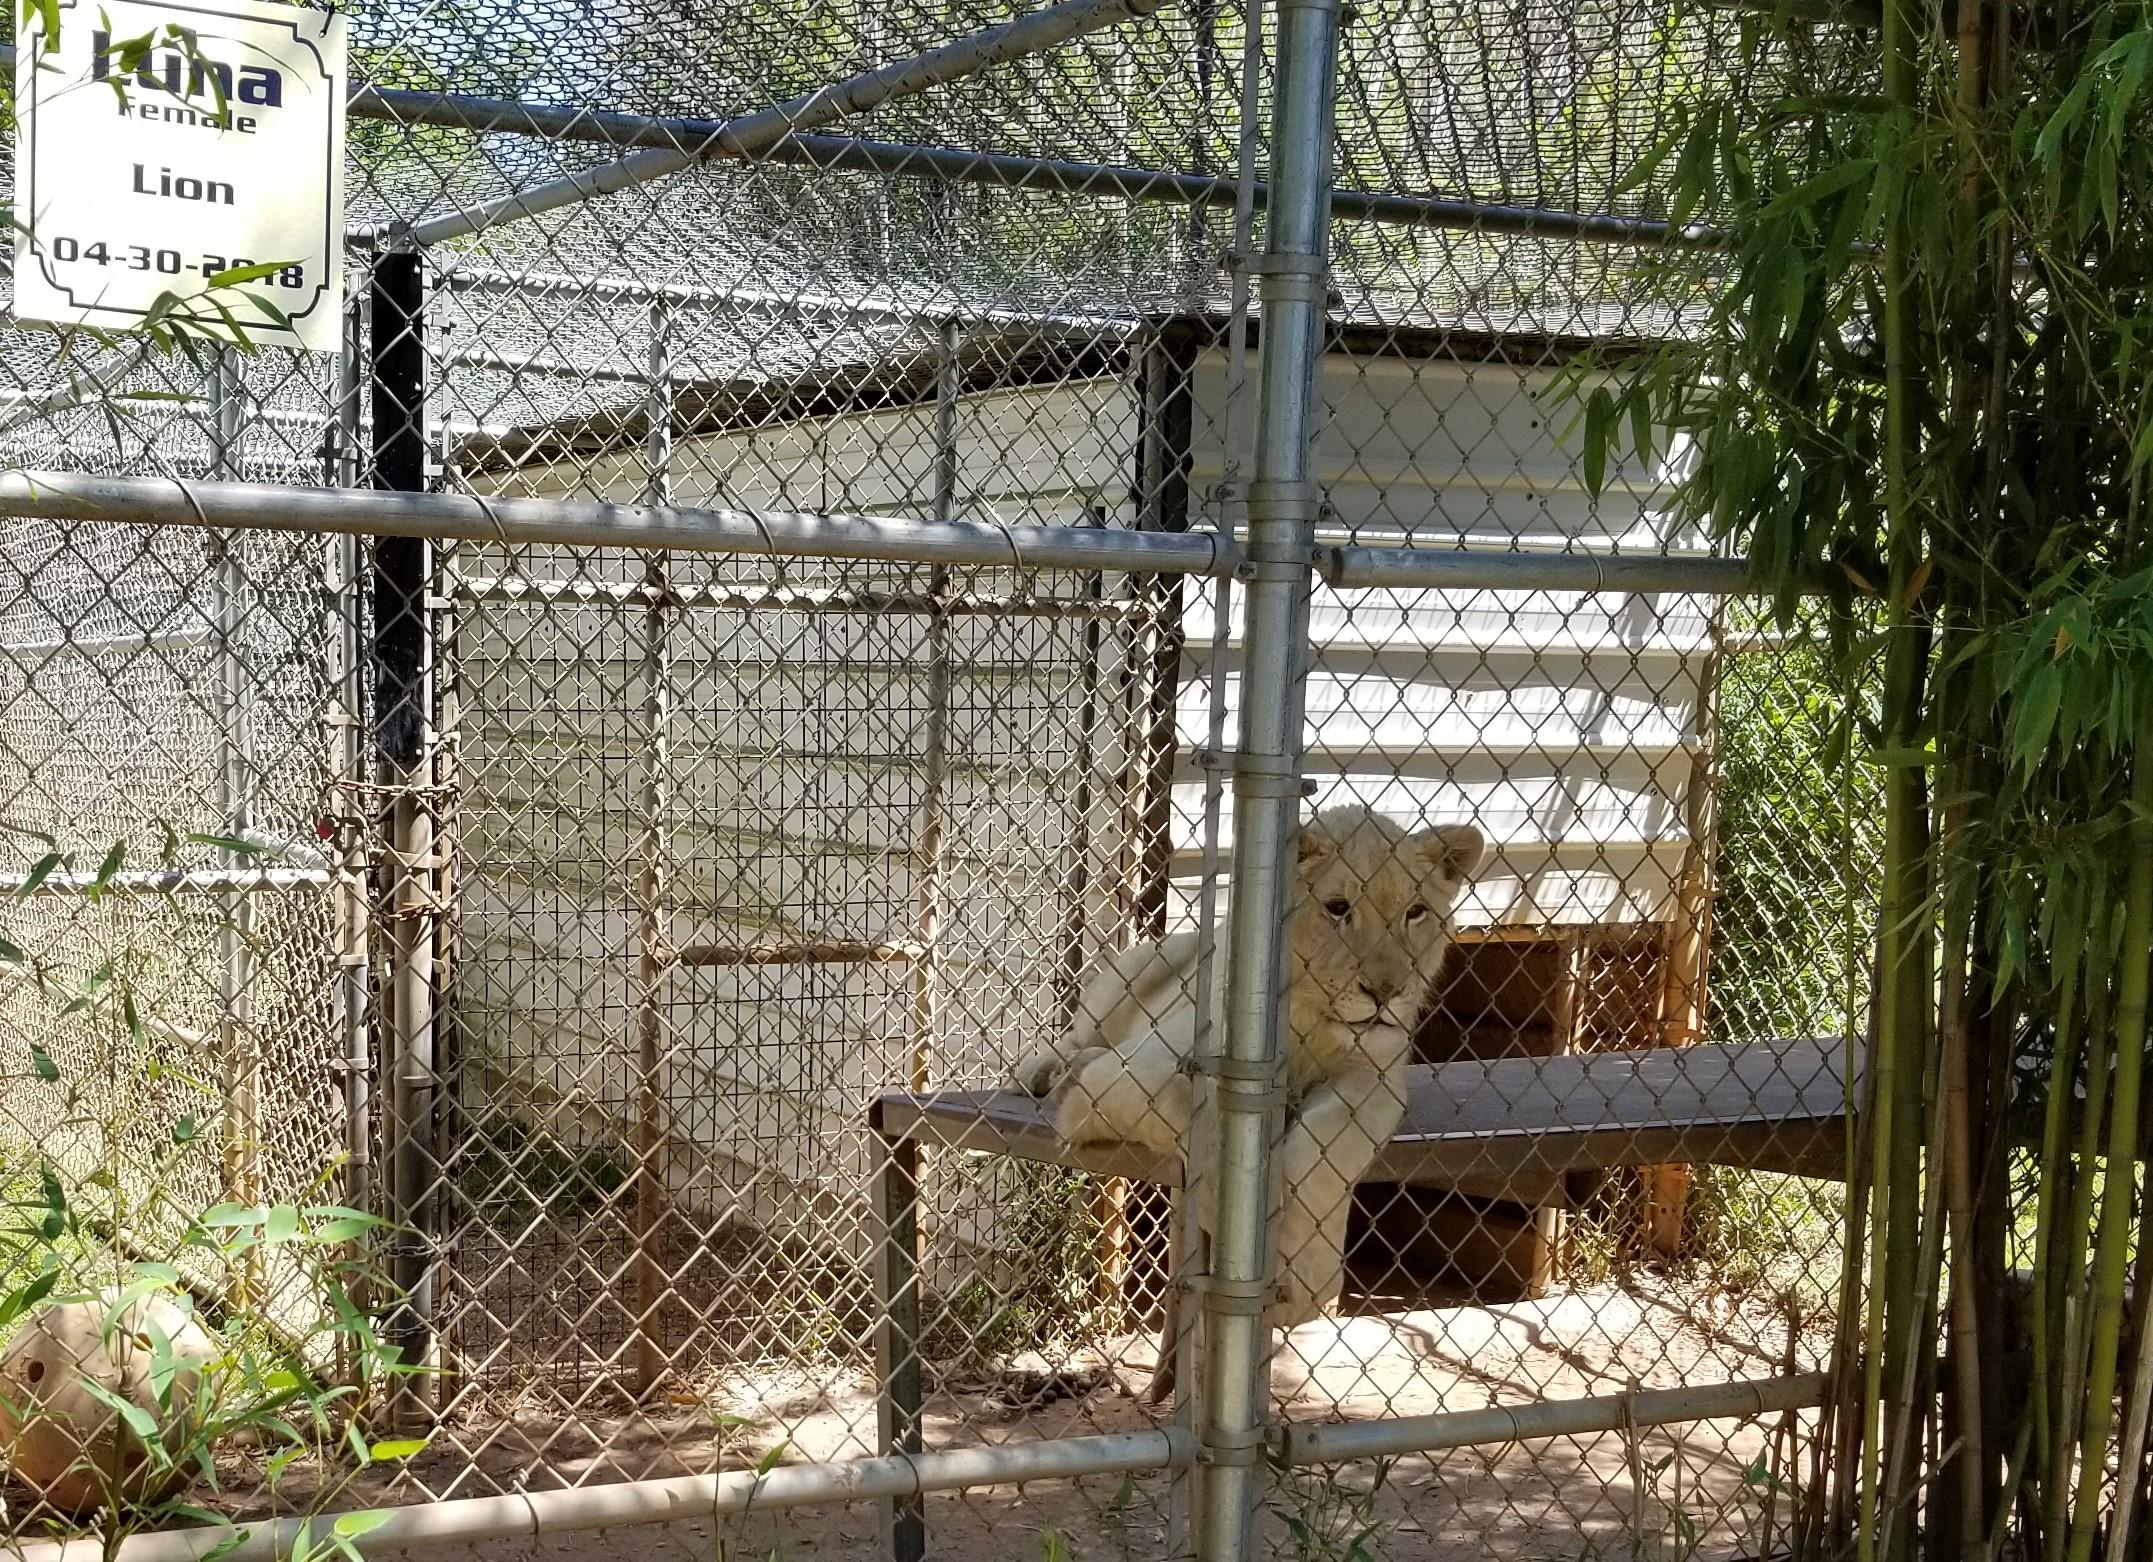 Luna a white African lion cub born 4/30/2018